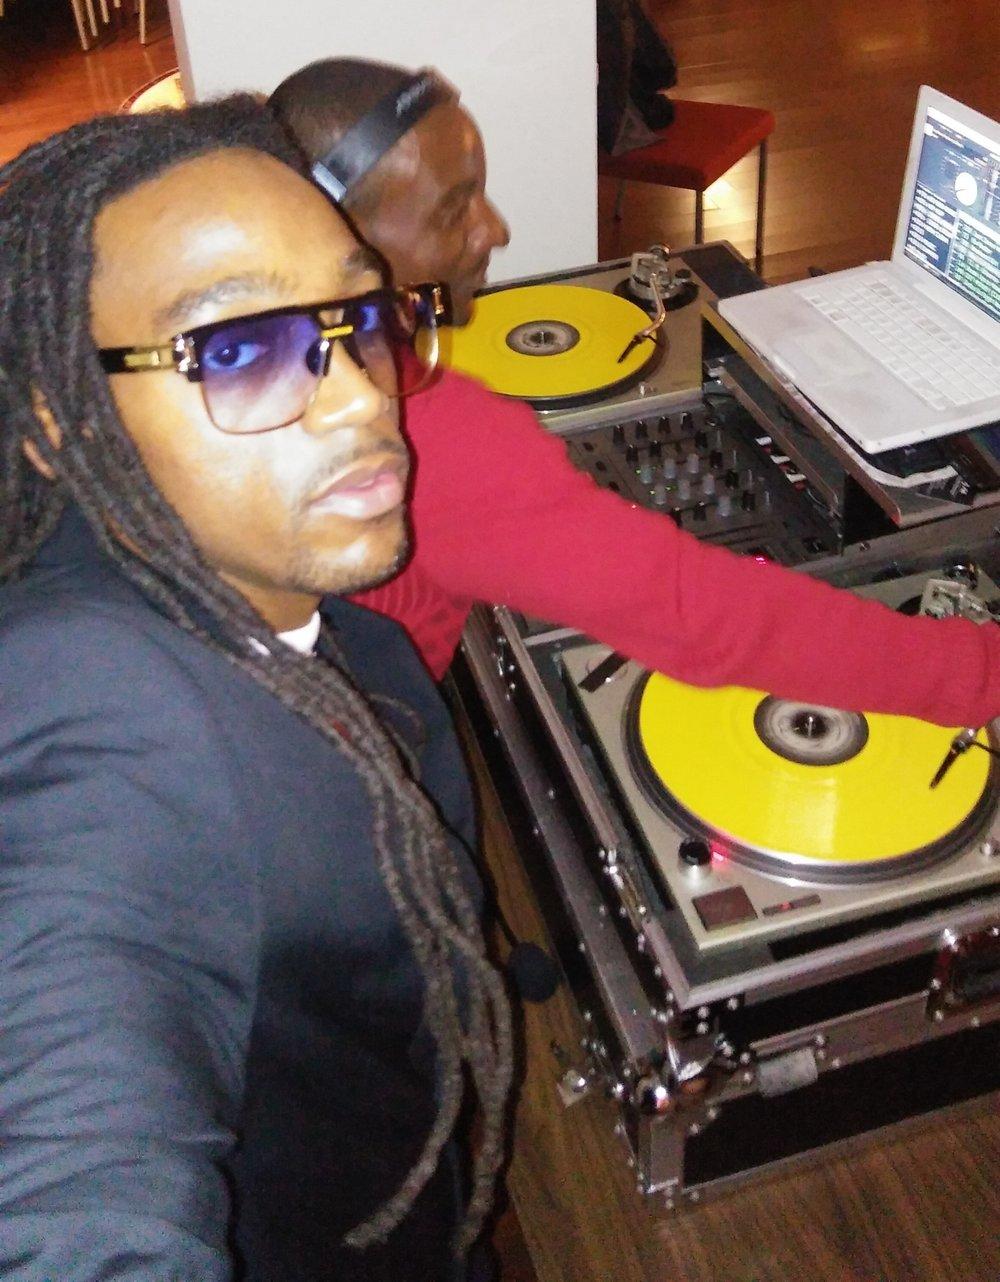 Image-I/ Afrikan Kartel w/ DJ ALI Hosting & Toasting @ Graduation Party